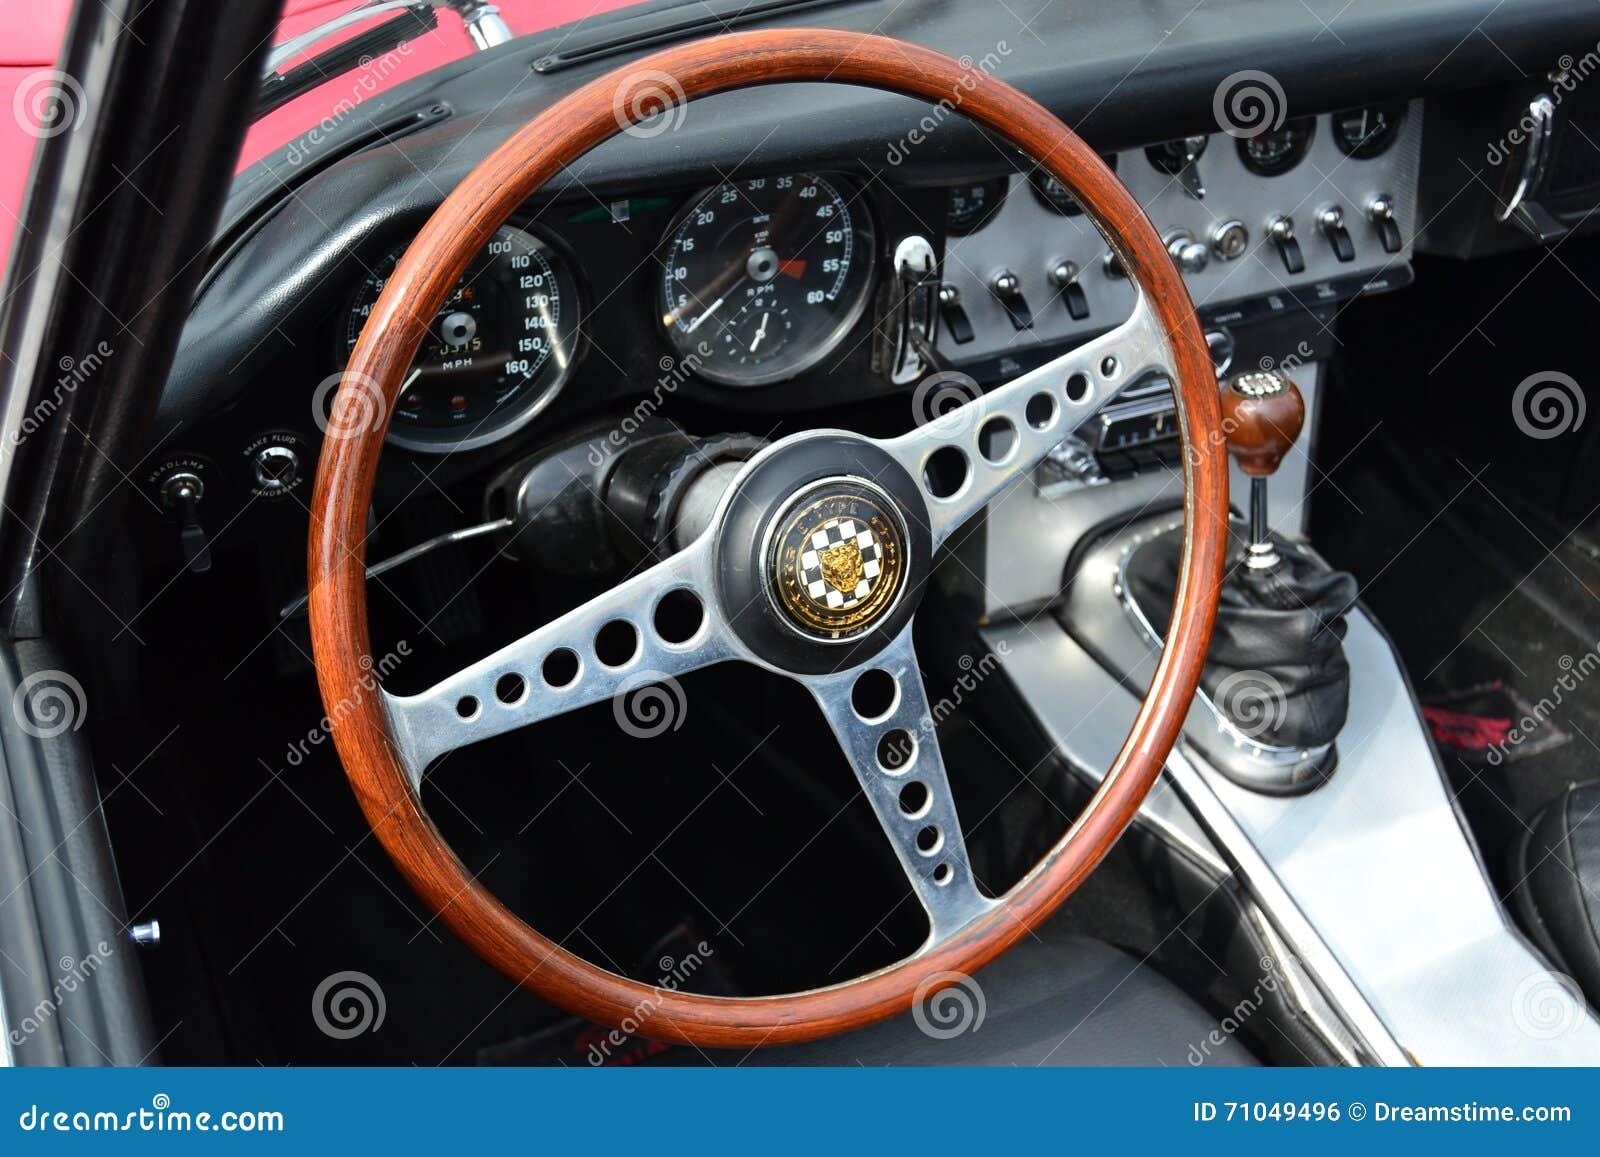 Classic Car Steering Wheel Stock Photo Image 71049496